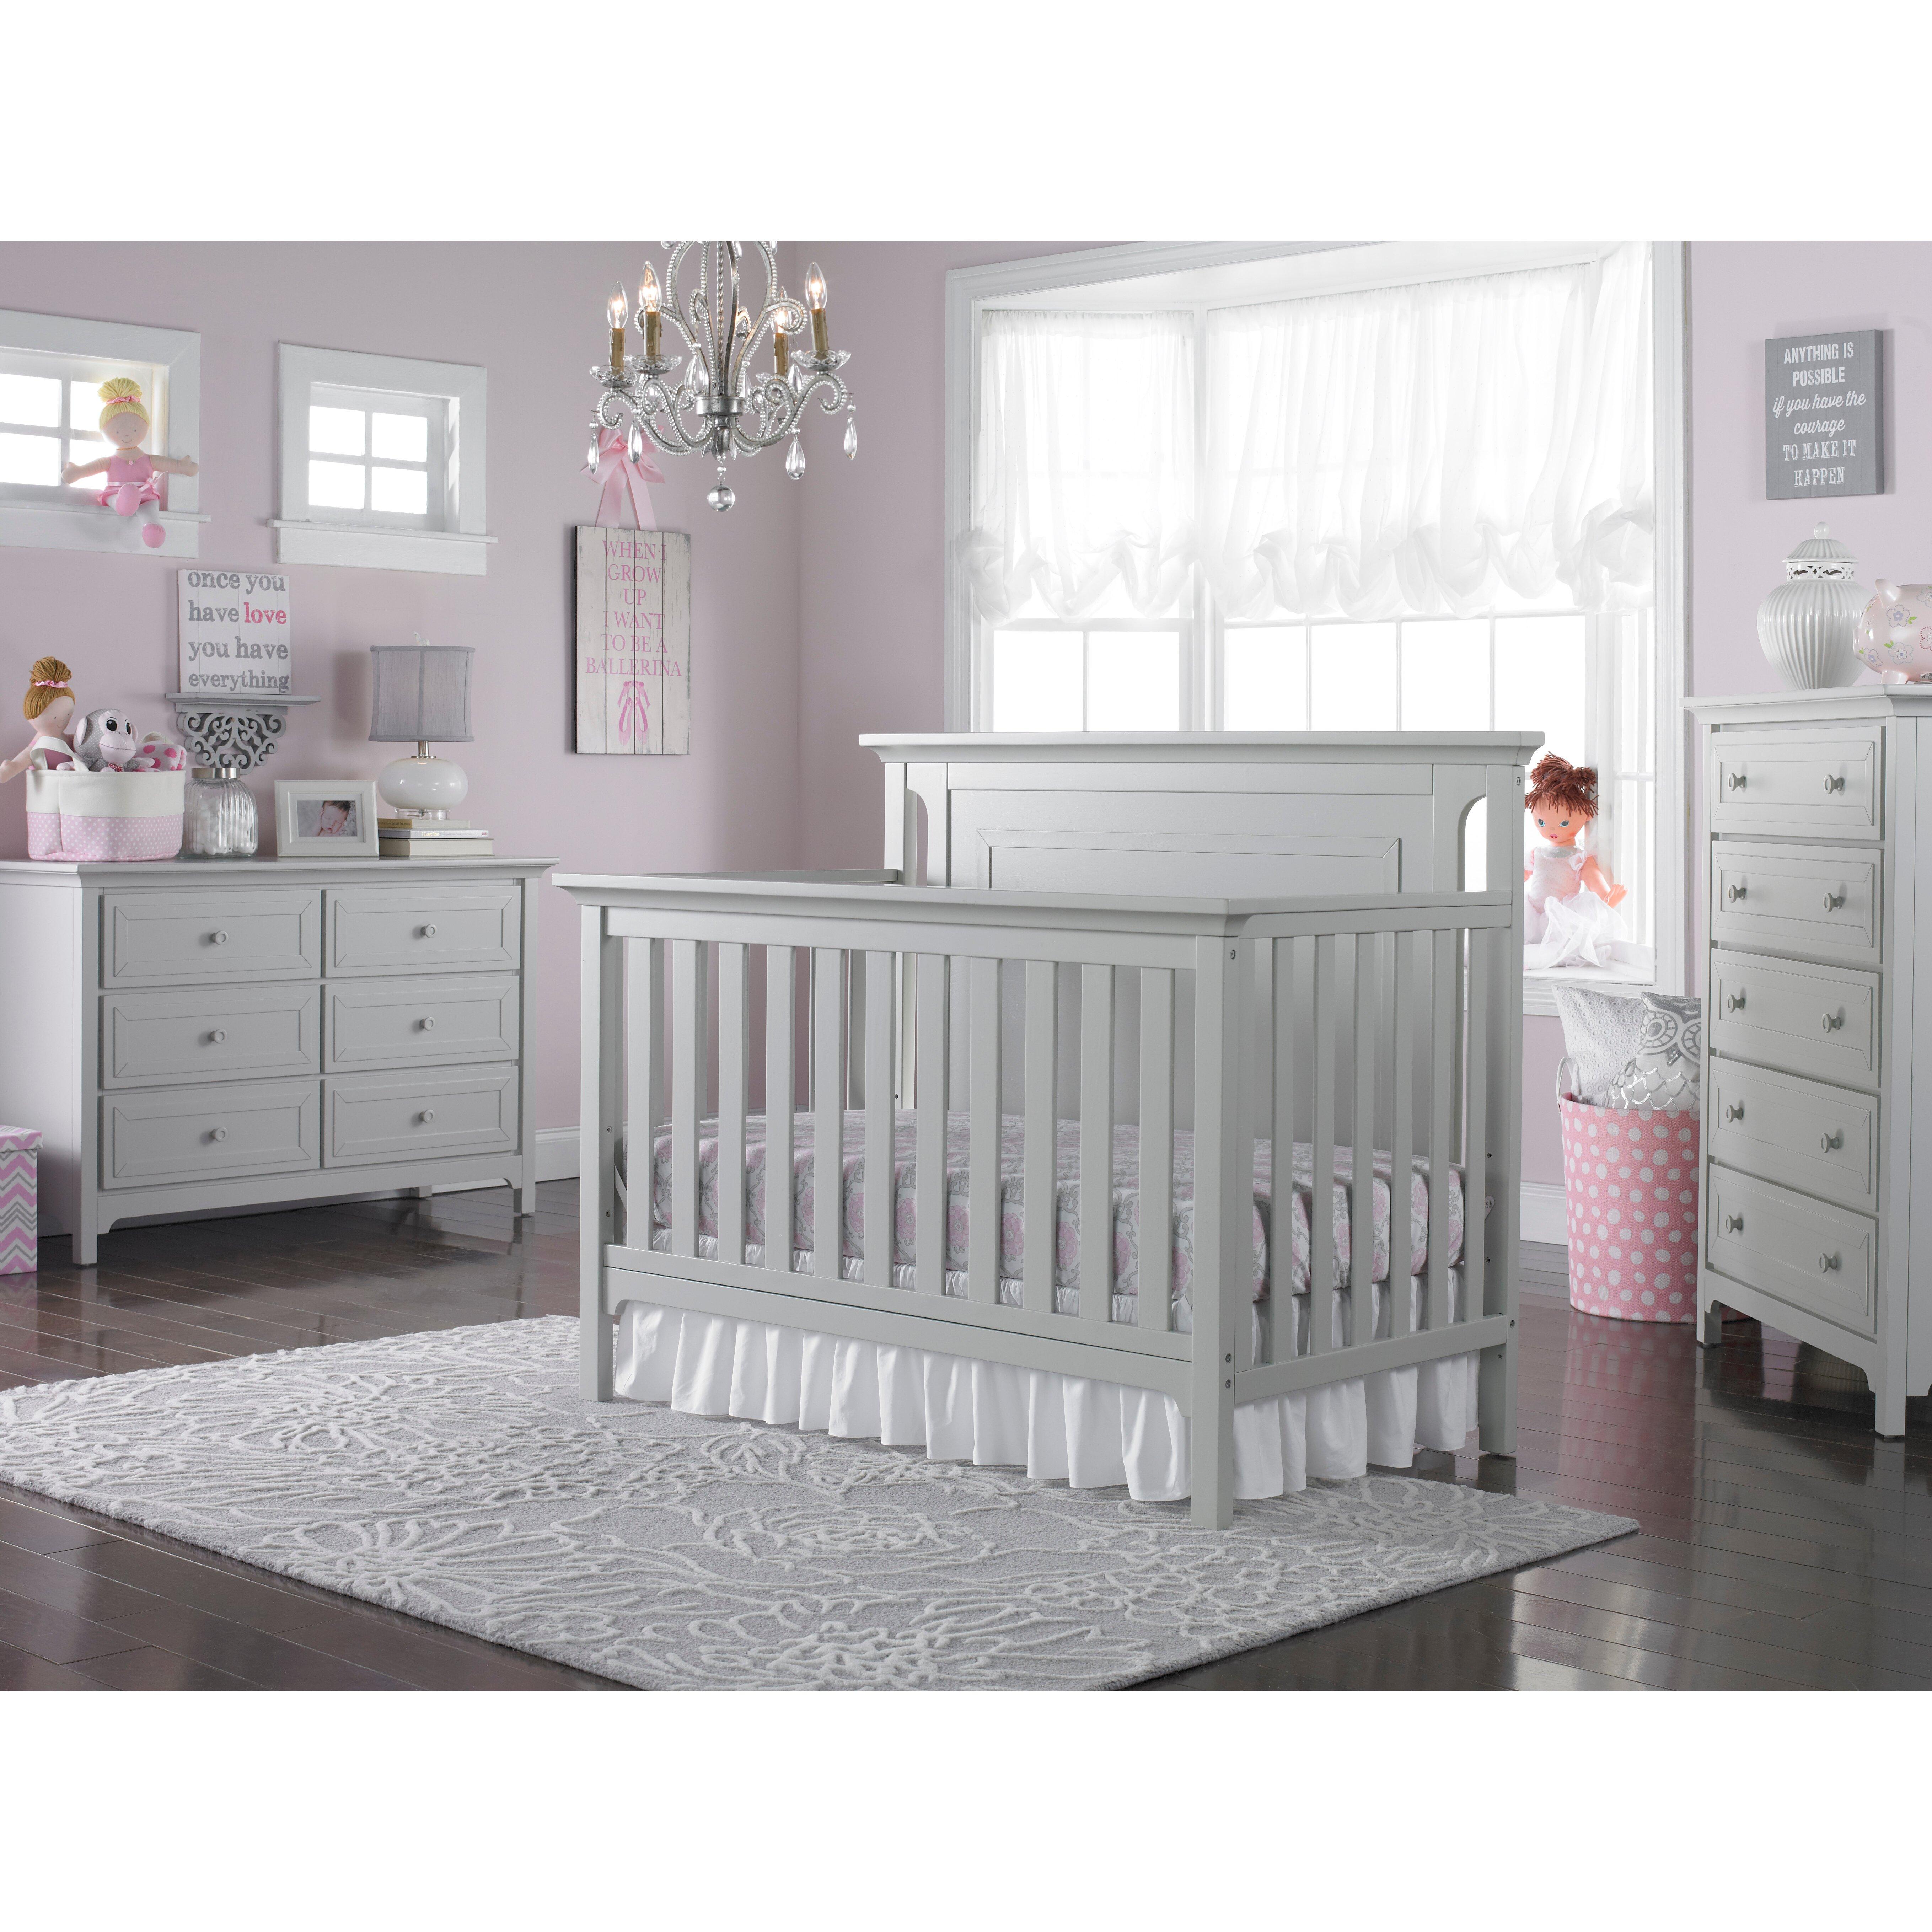 Crib thanksgiving sale - Grey Crib For Sale Ti Amo Carino 4 In 1 Convertible Crib